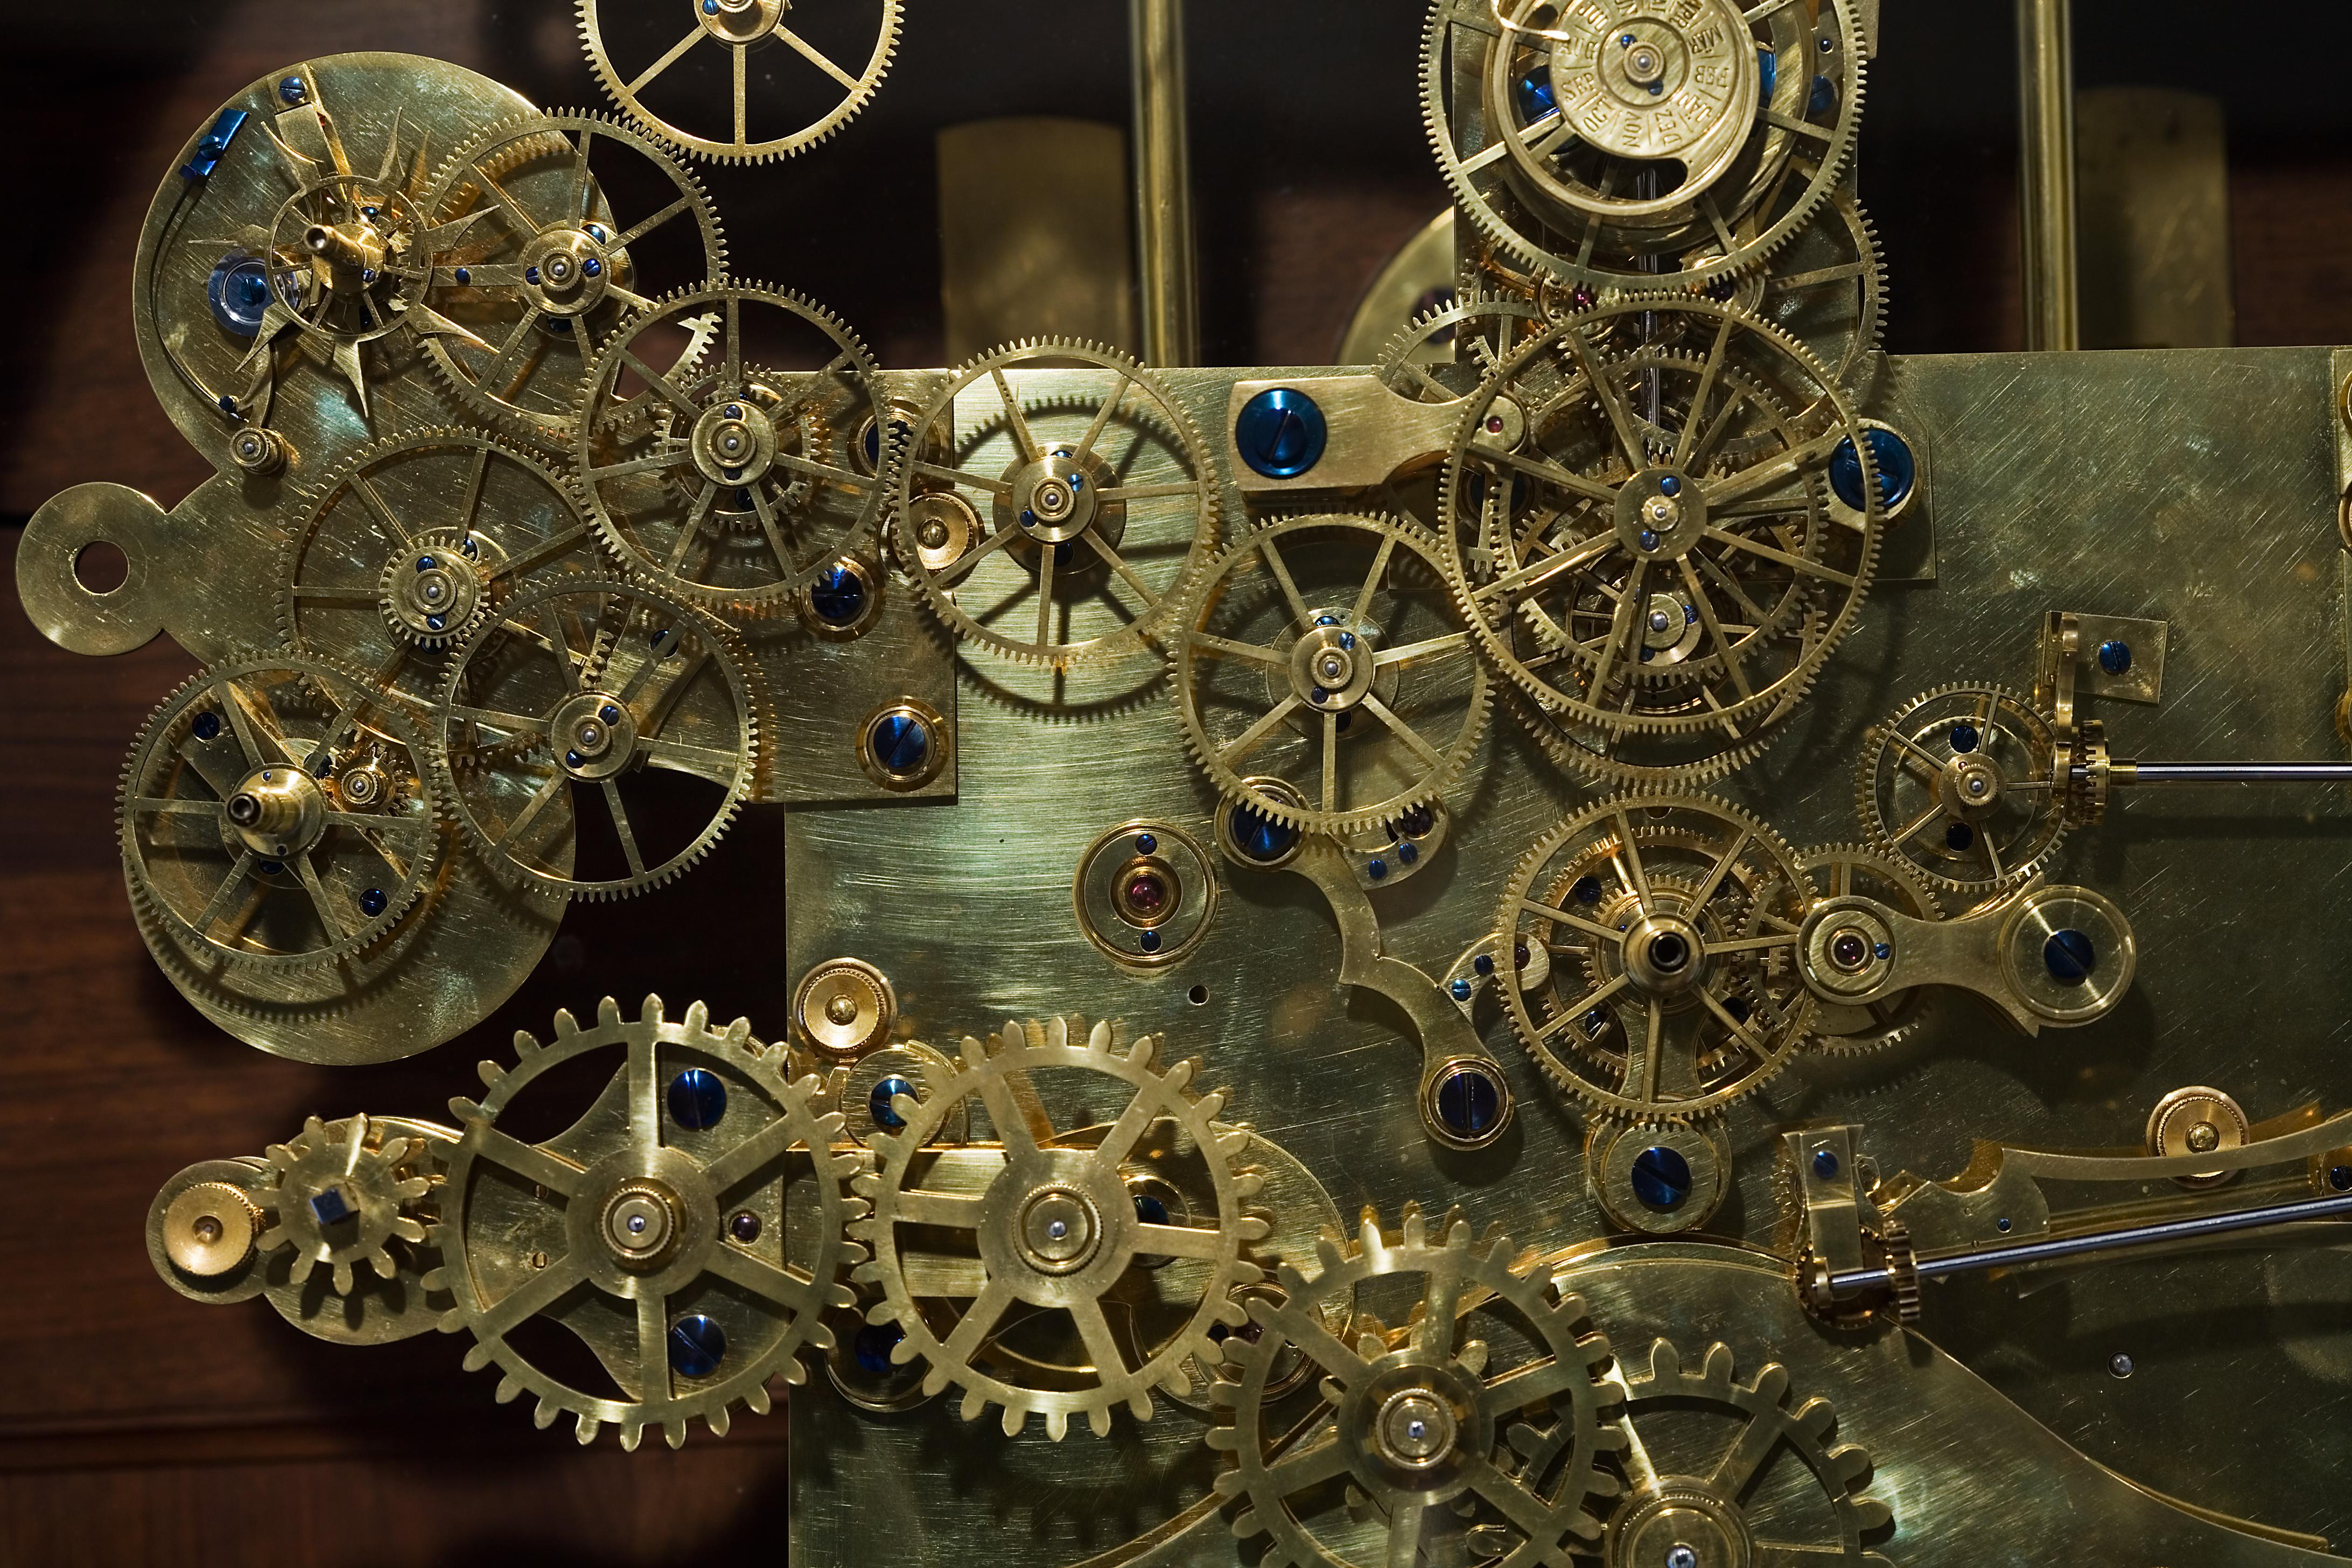 File:Vienna - Vintage Franz Zajizek Astronomical Clock machinery - 0537.jpg ...